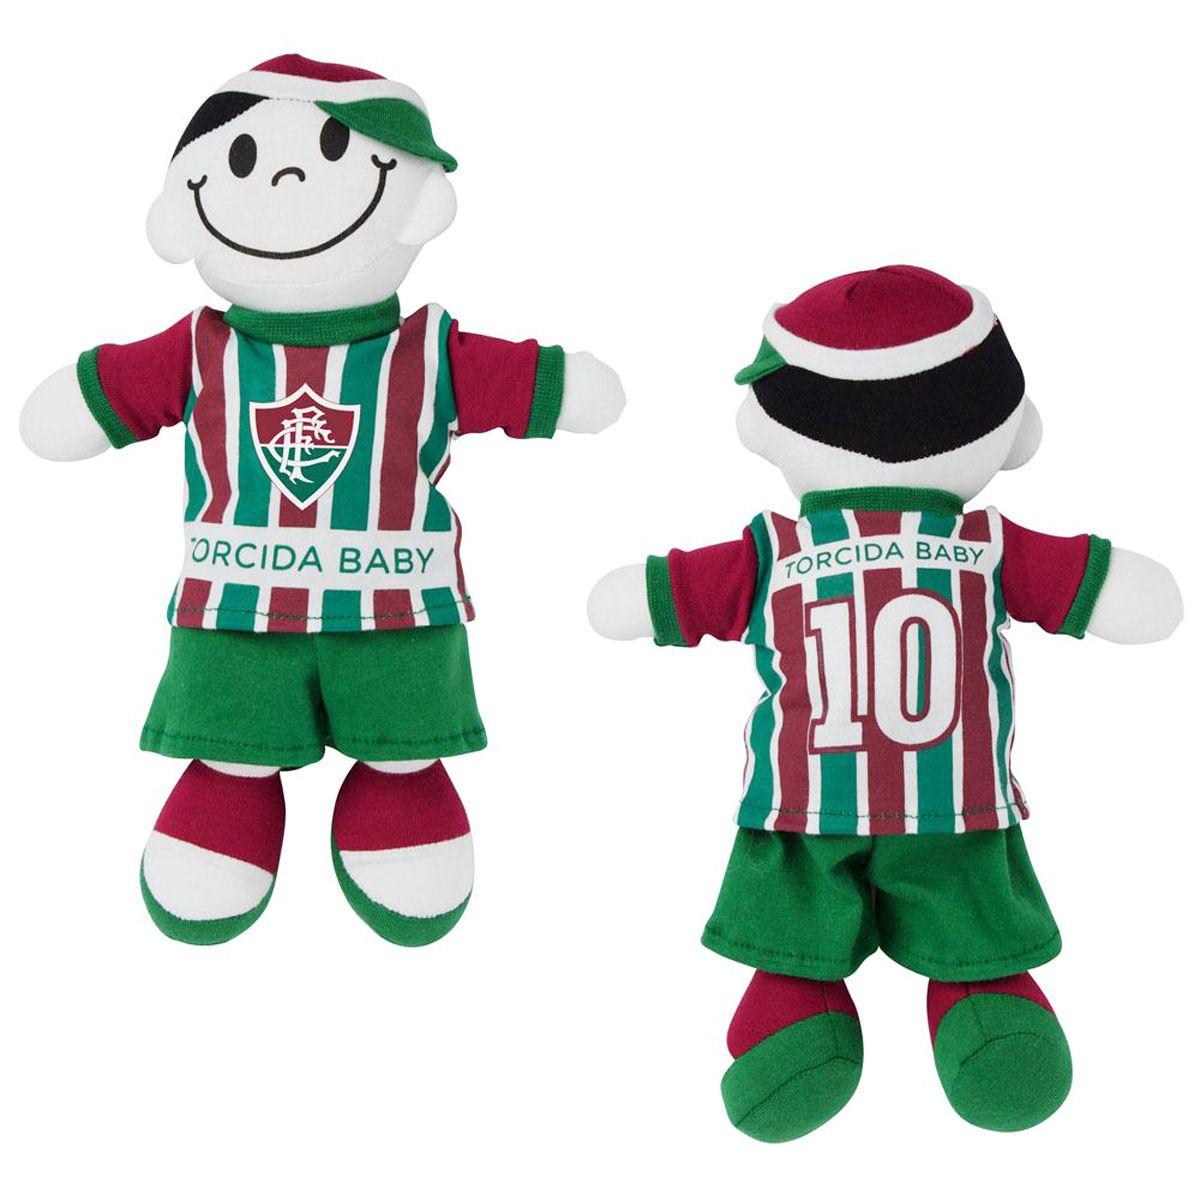 Boneco Mascote do Fluminense - Torcida Baby 238A